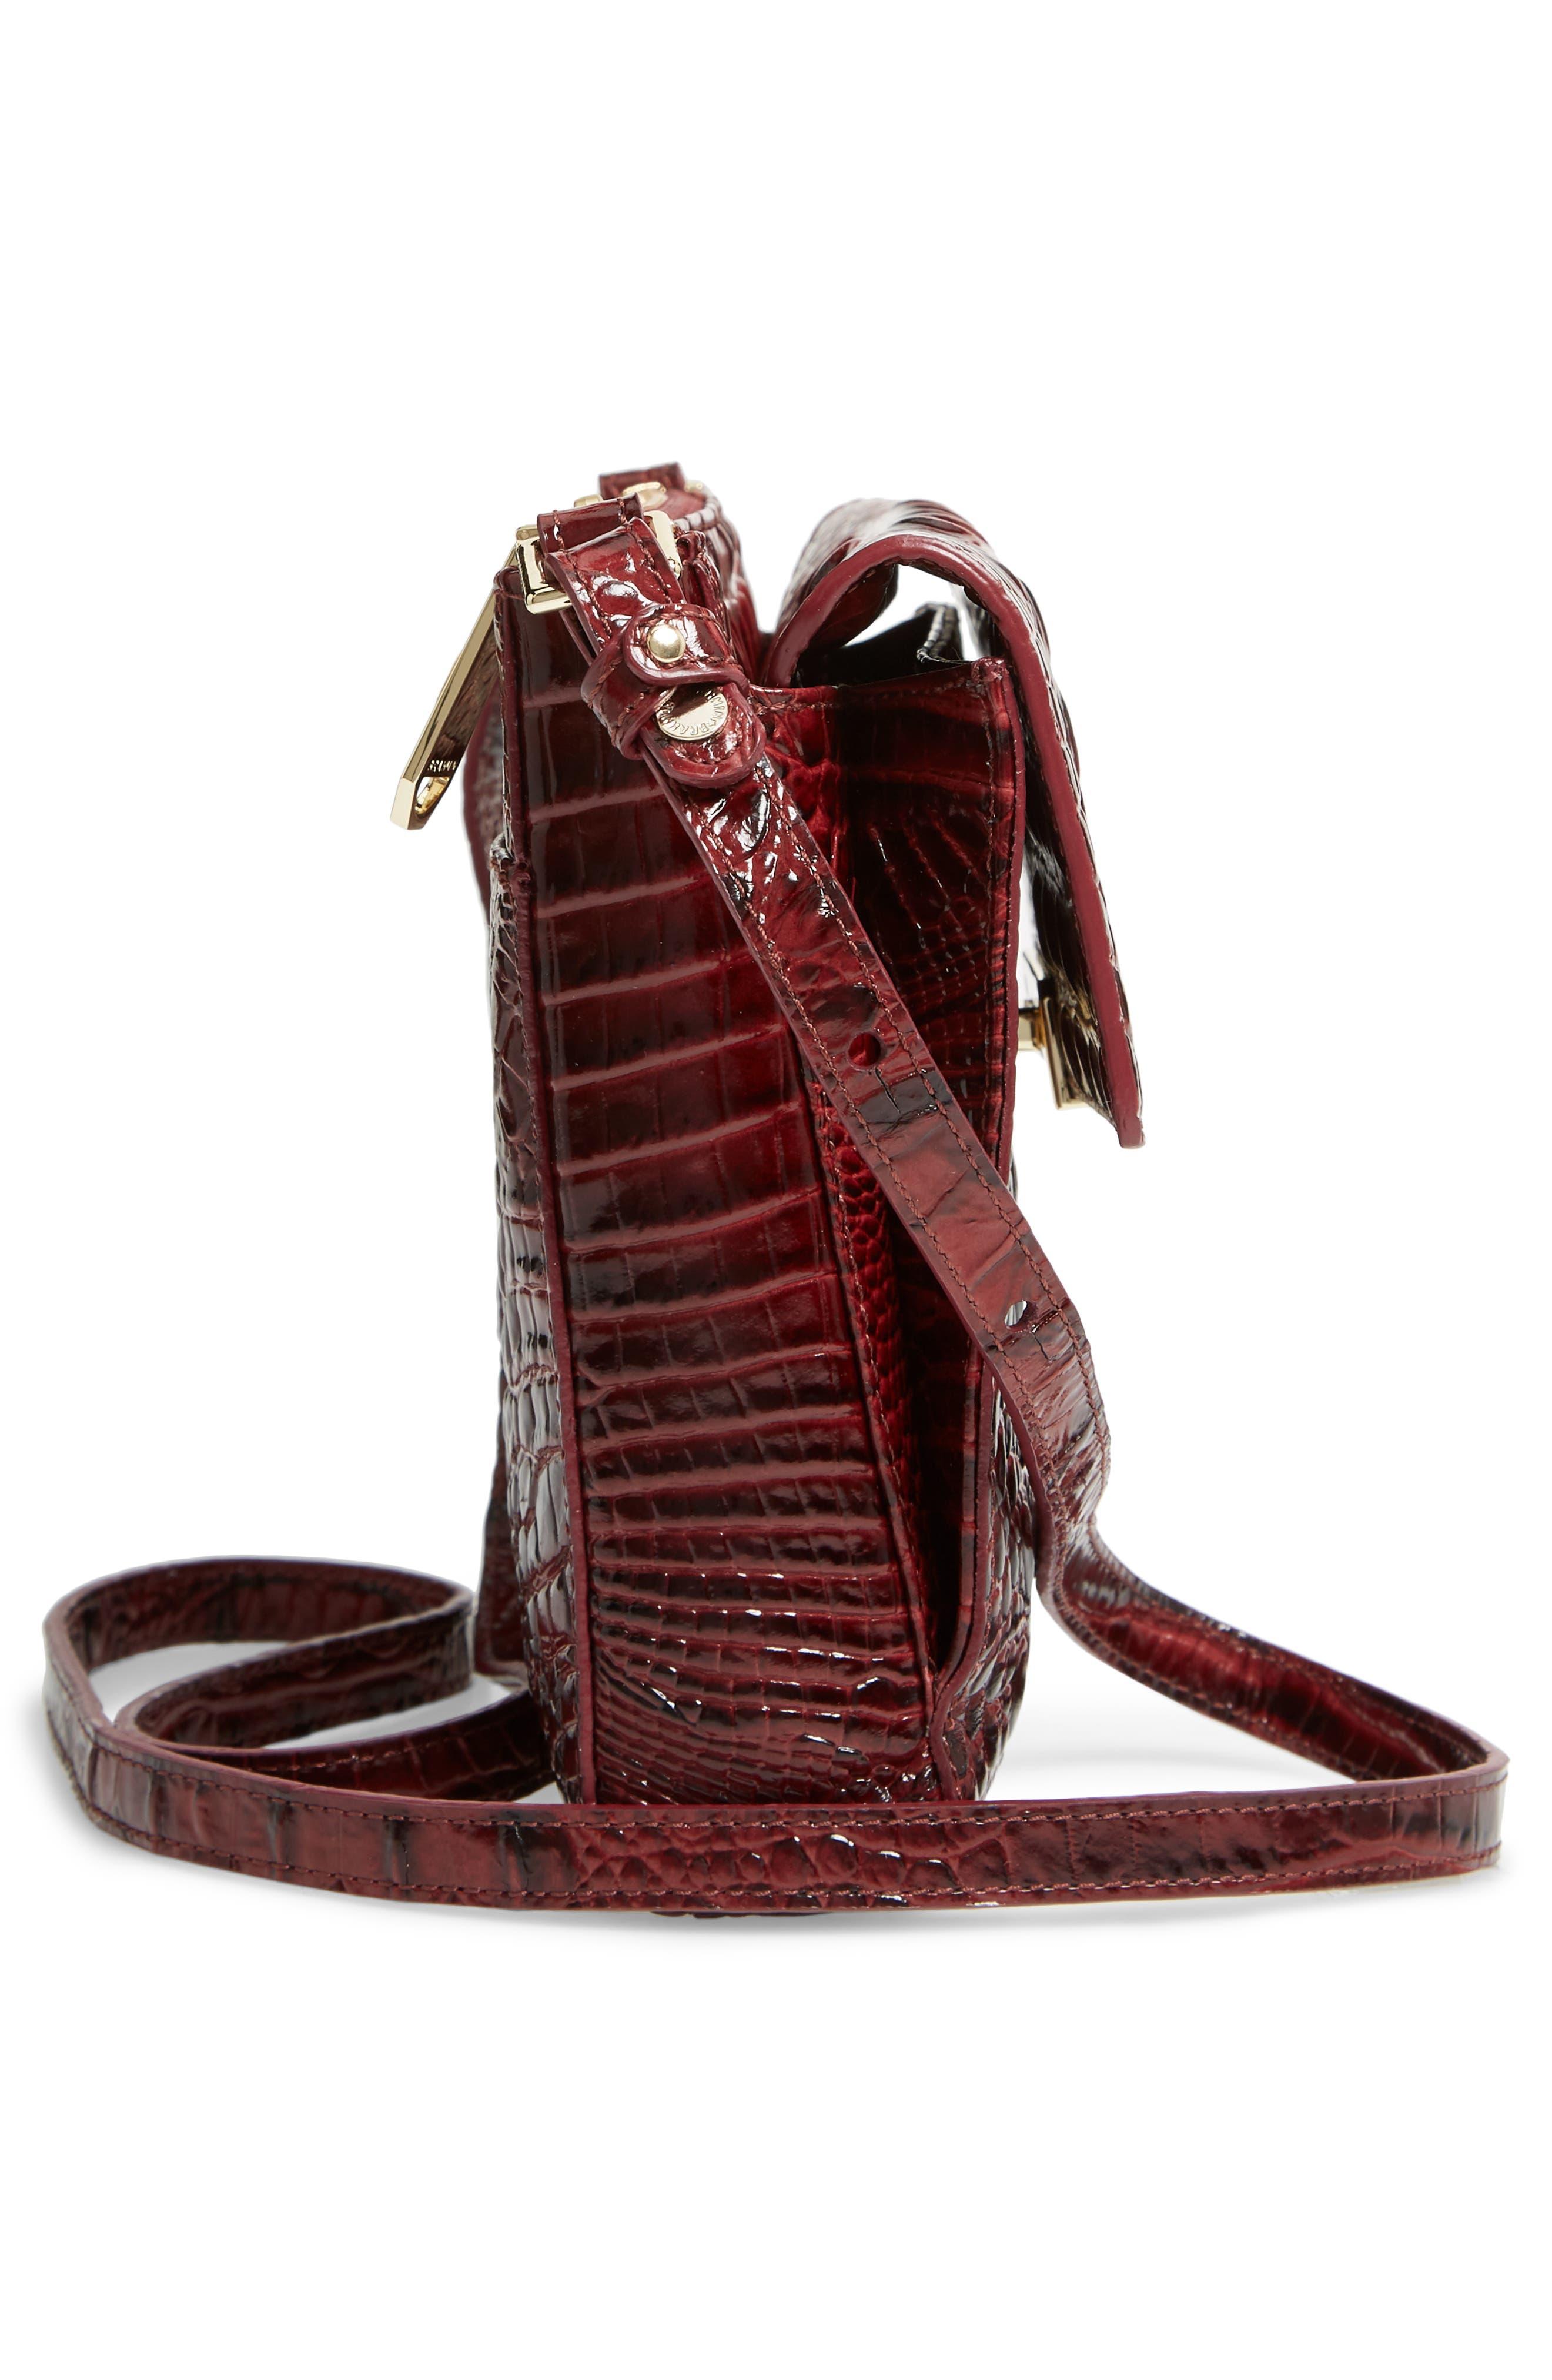 Melbourne Manhattan Croc Embossed Leather Crossbody Bag,                             Alternate thumbnail 3, color,                             Tart